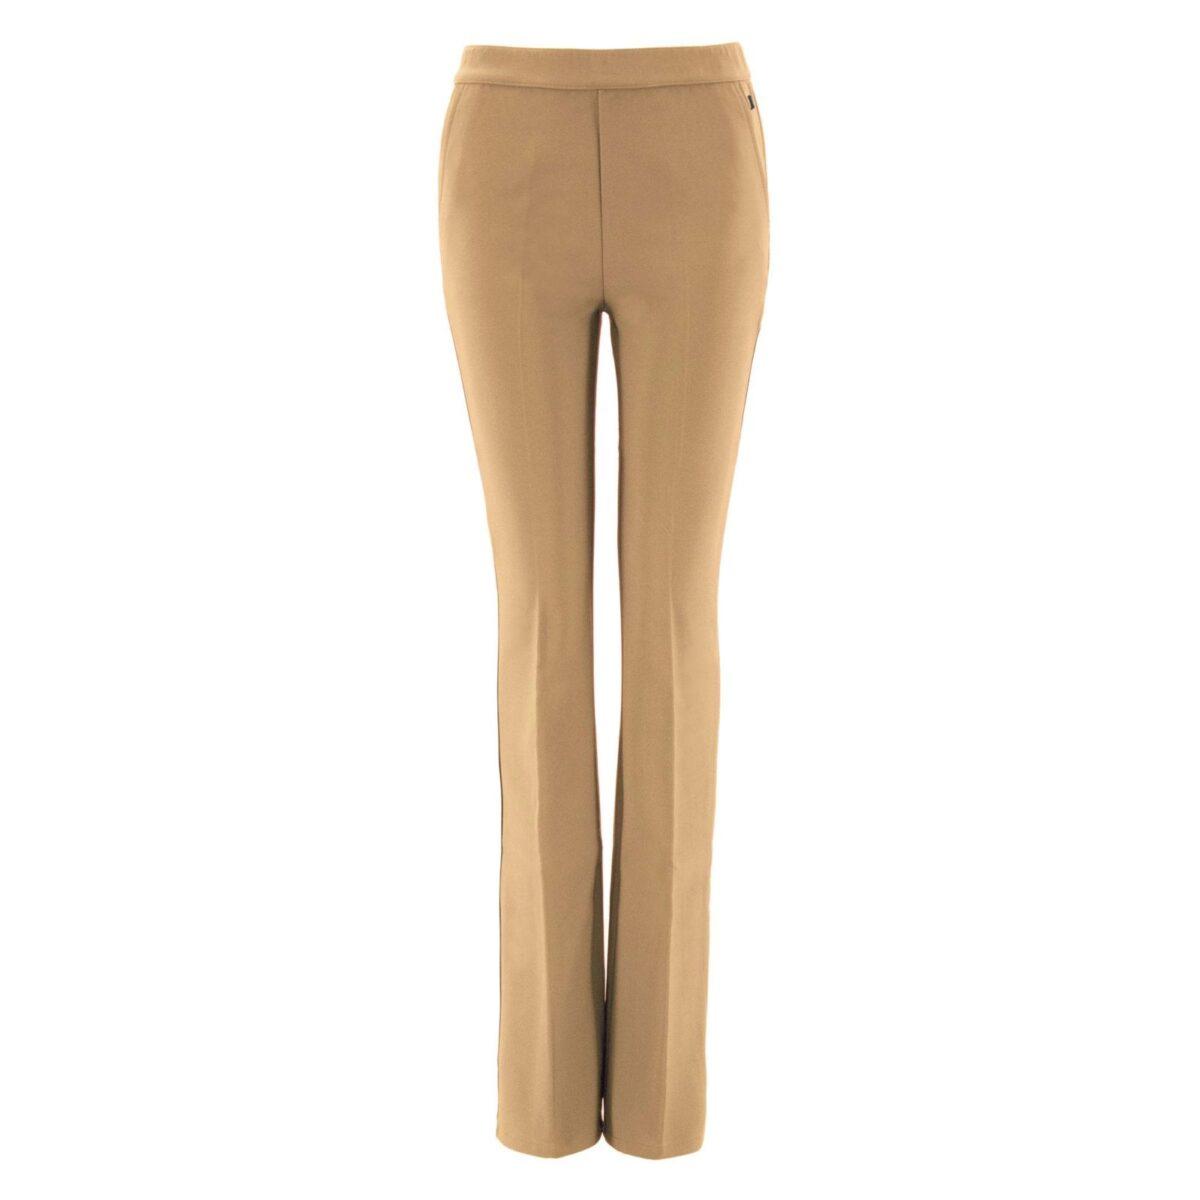 Pantalone Bootcut NATURALE - vista frontale | Nicla